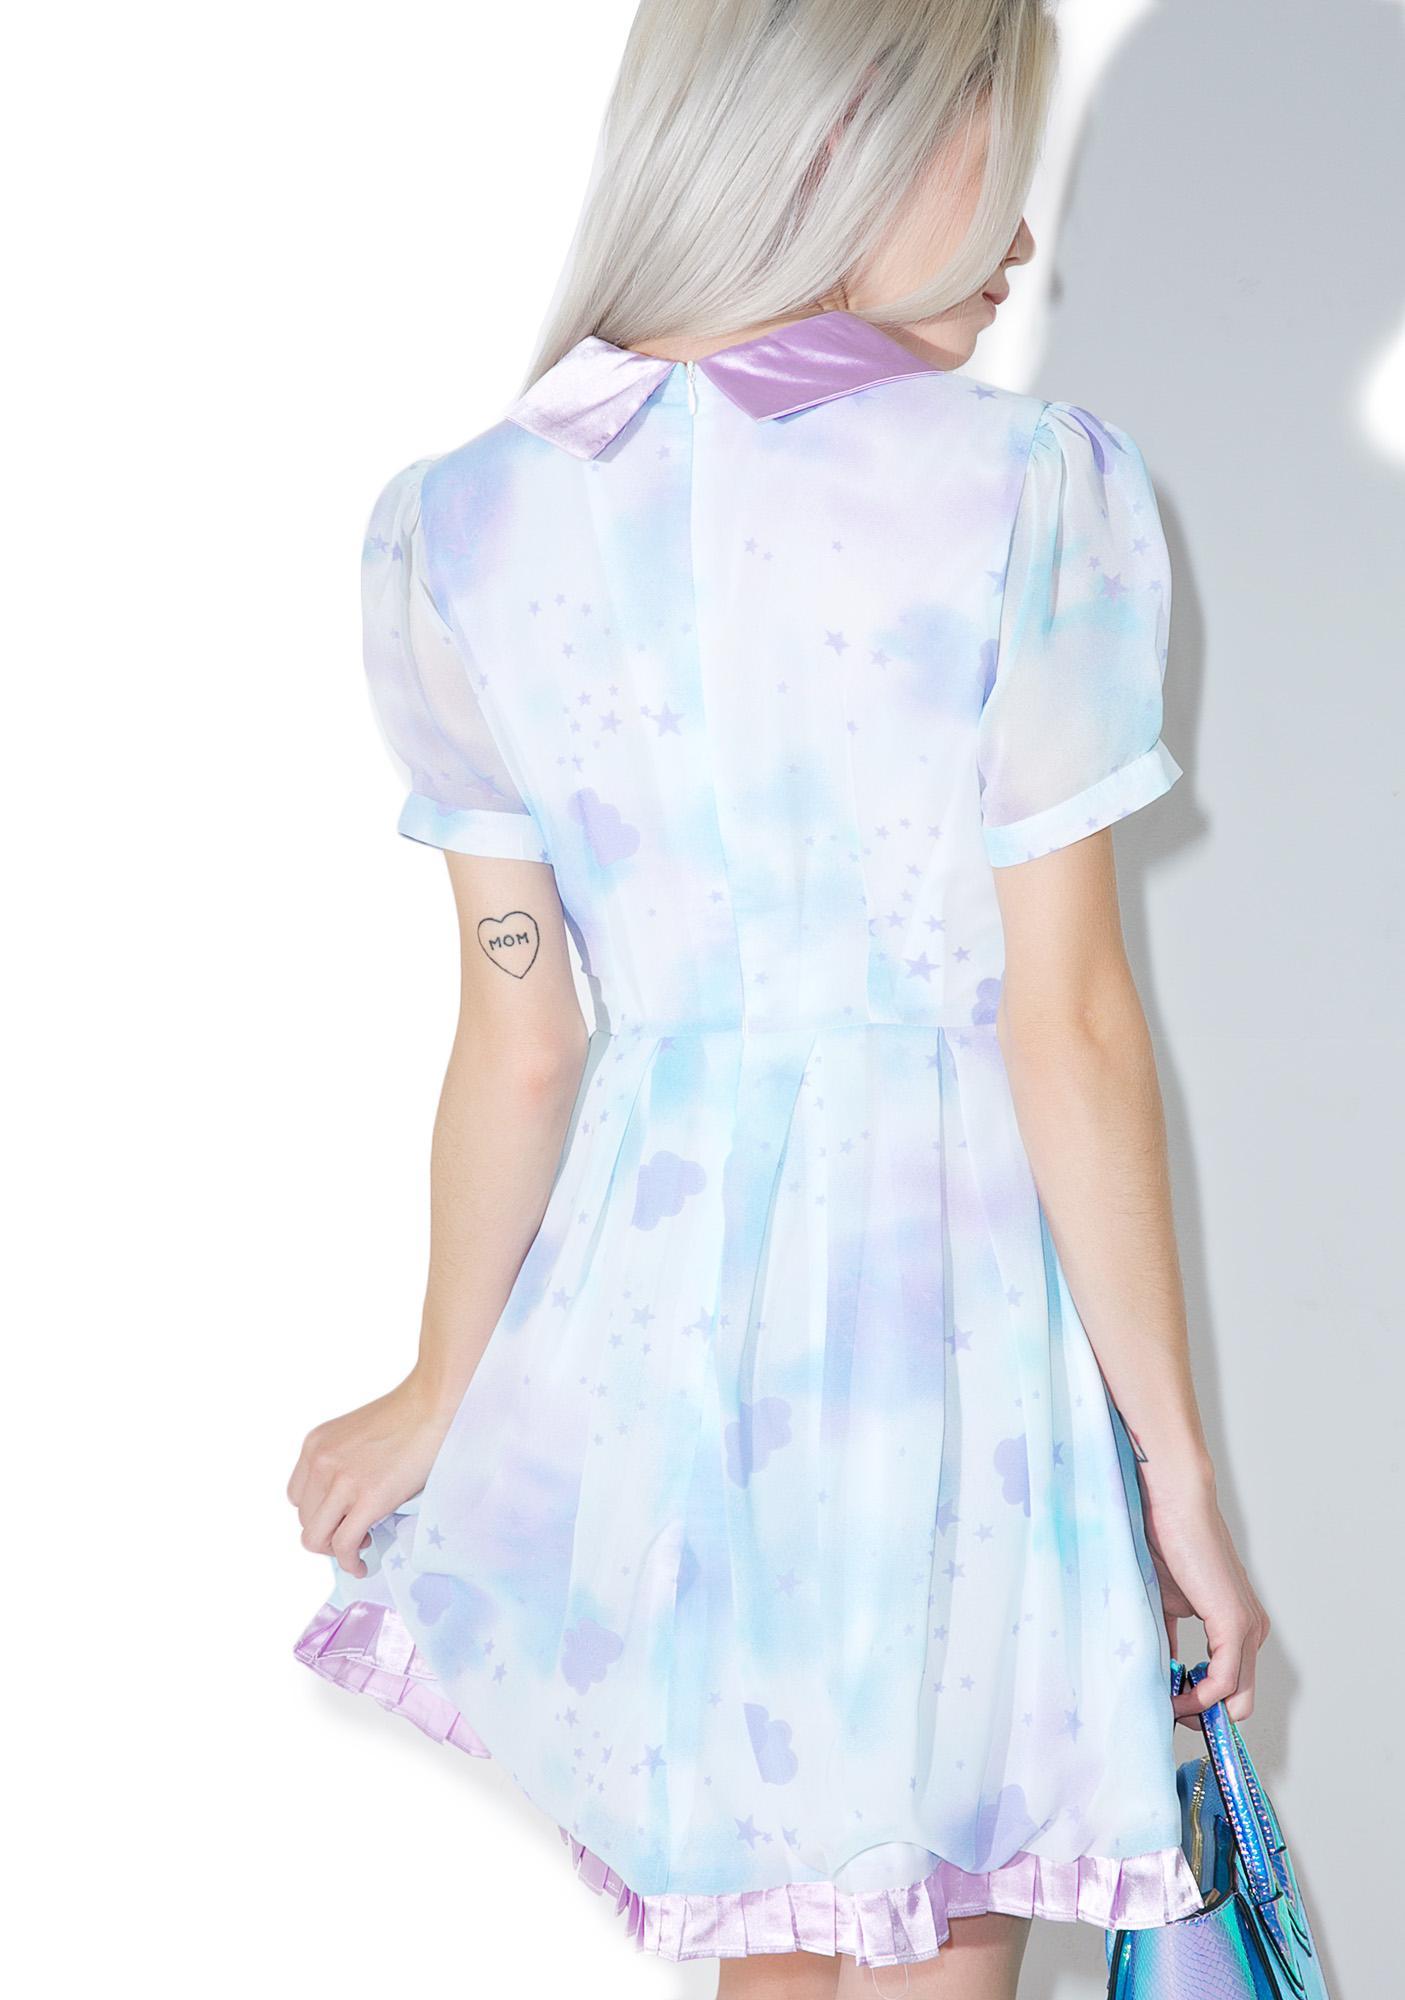 Melonhopper First Impressions Dress